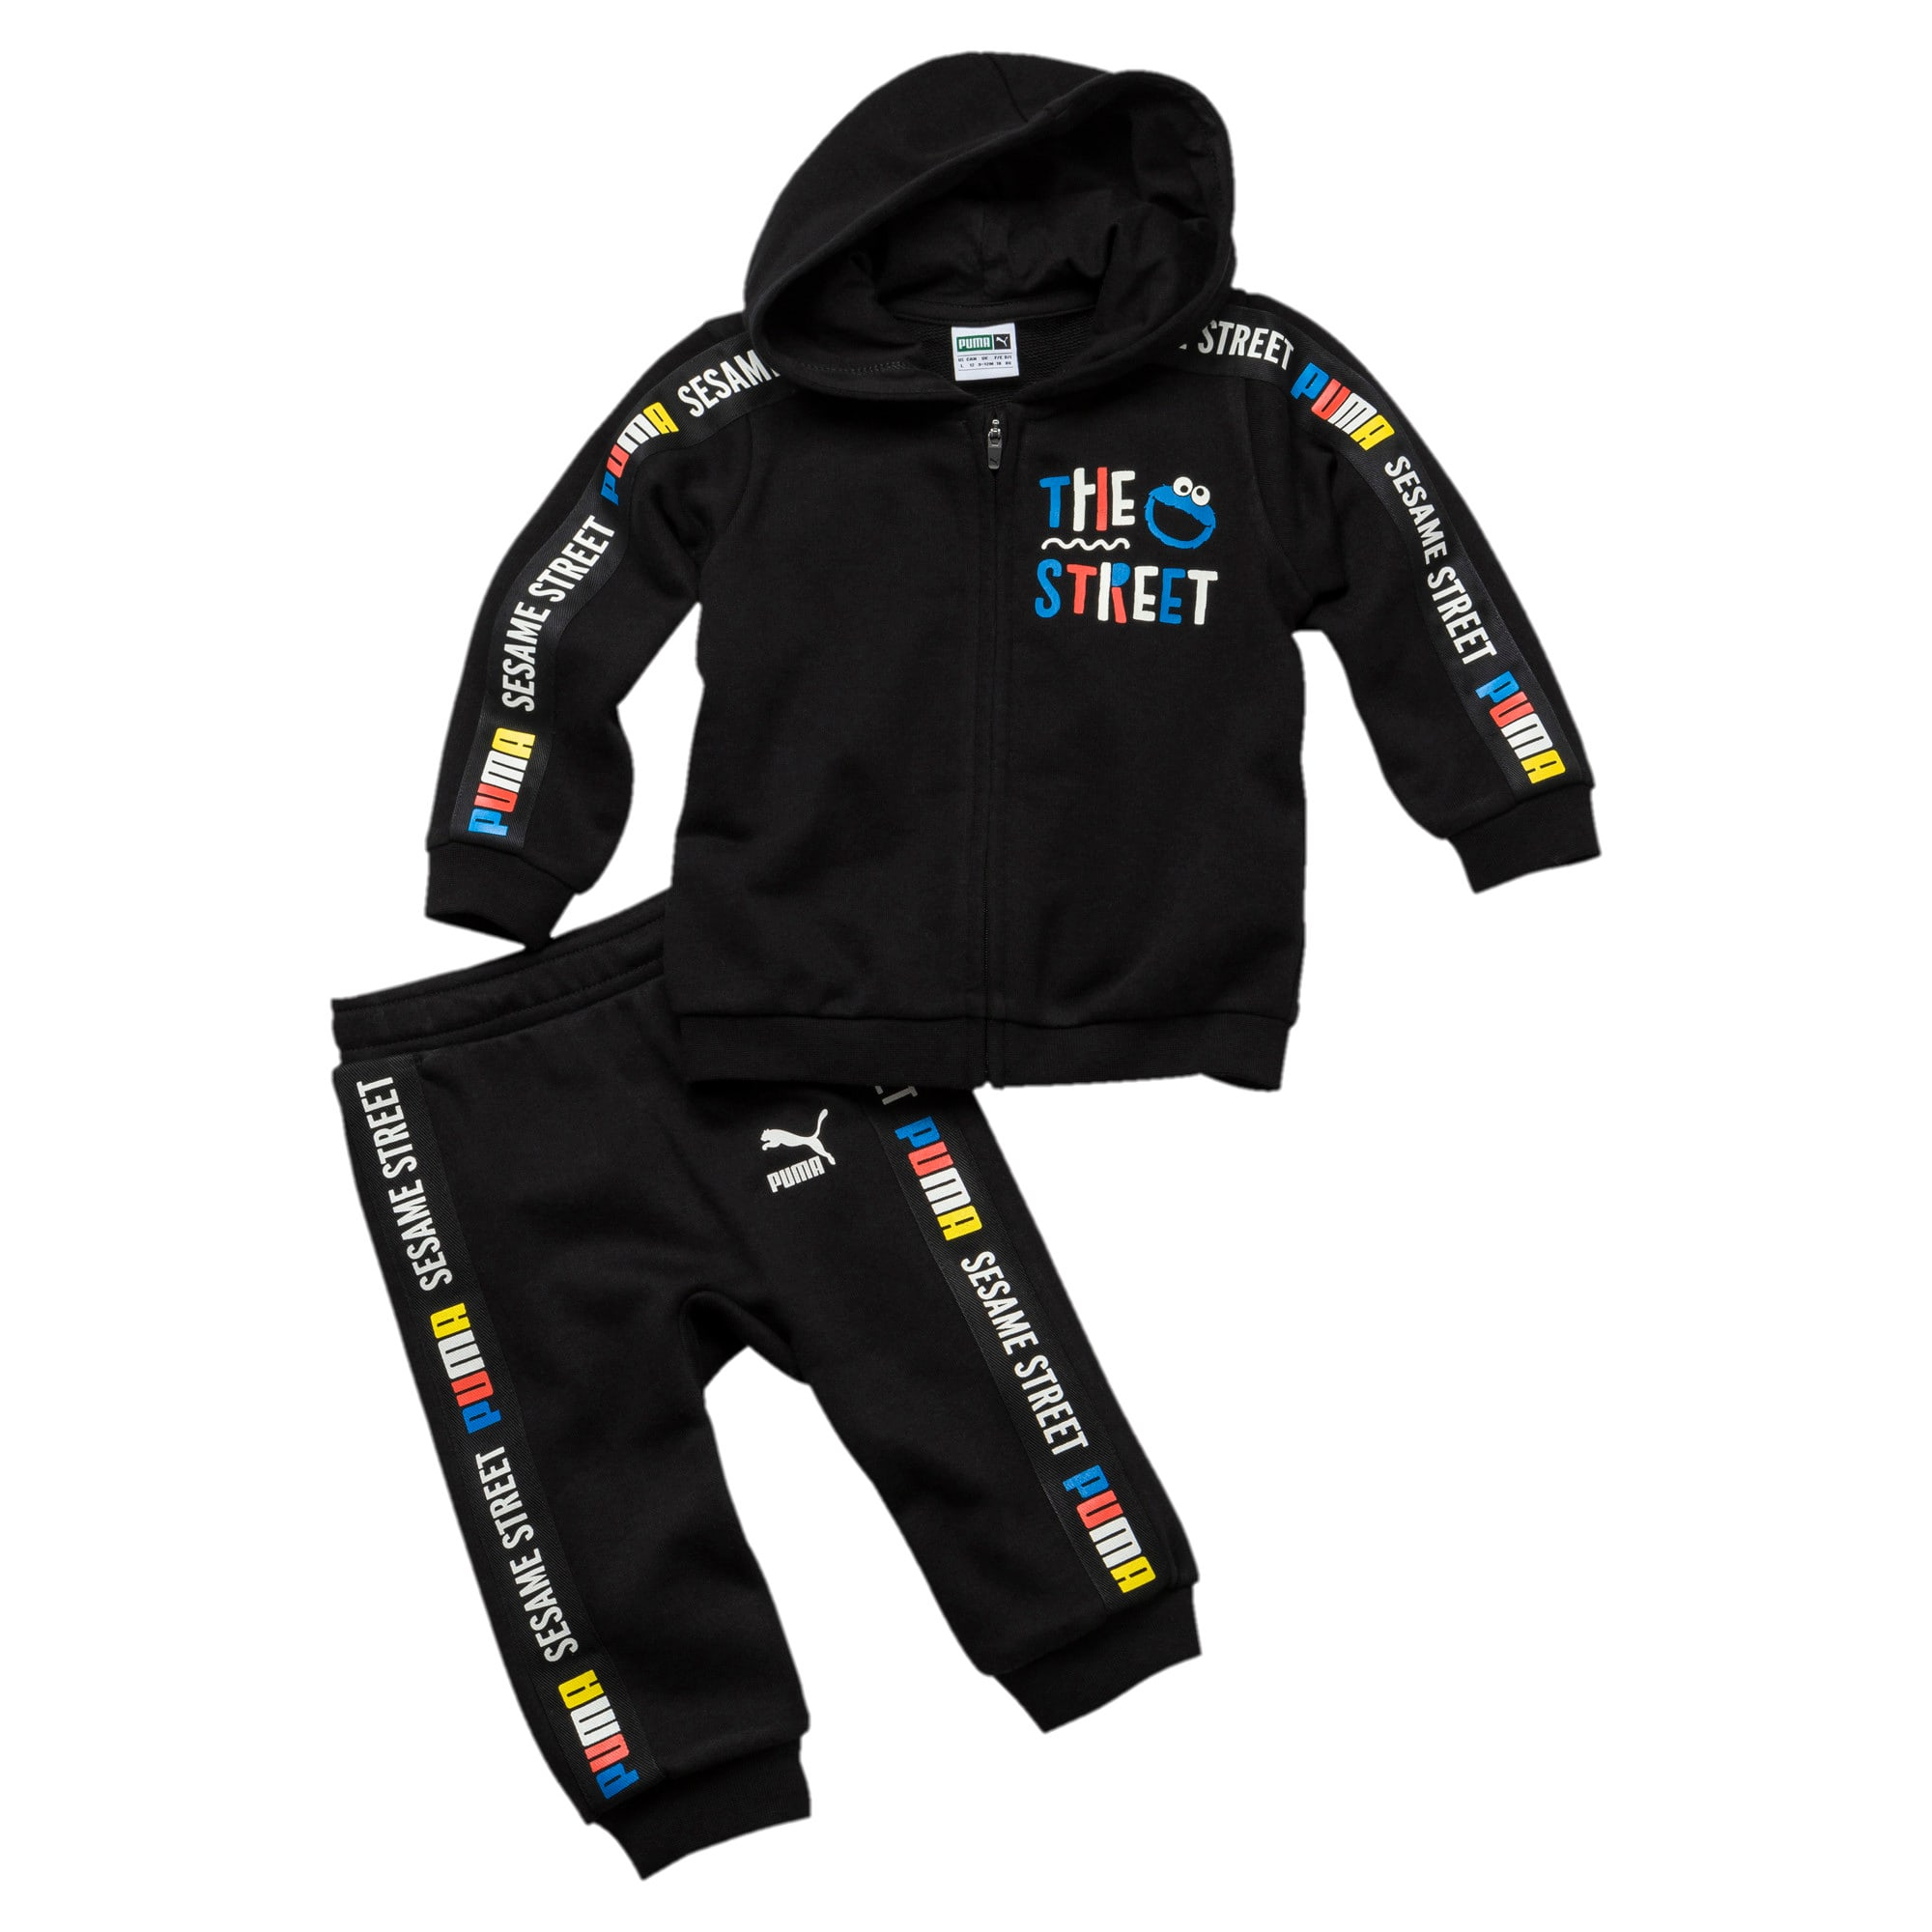 Thumbnail 1 of PUMA x SESAME STREET Infant + Toddler Sweatsuit Set, Cotton Black, medium